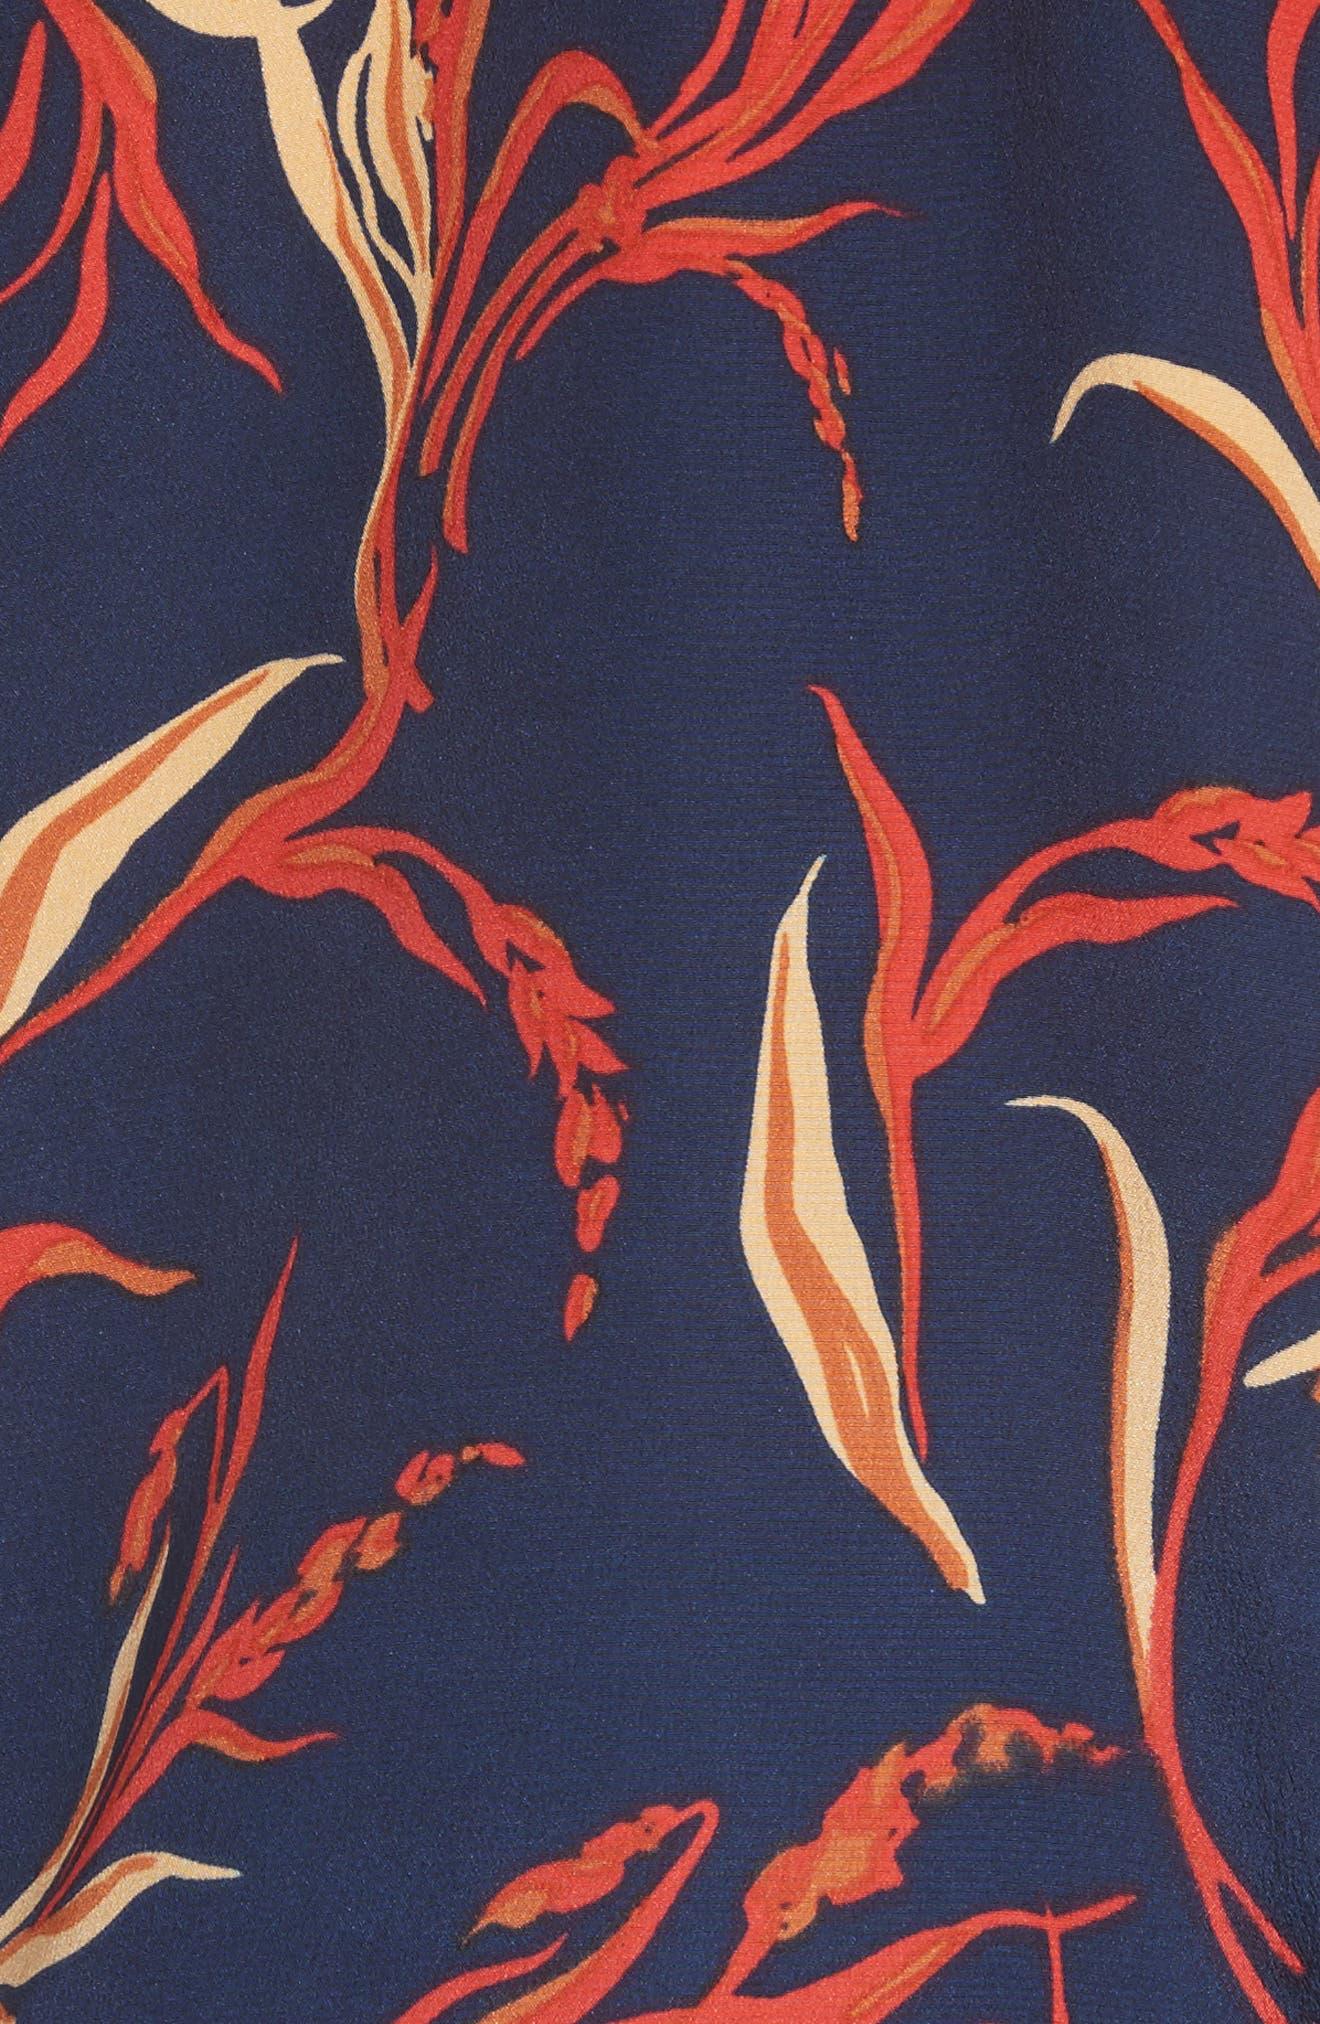 Mary Jane Silk Tank,                             Alternate thumbnail 5, color,                             460